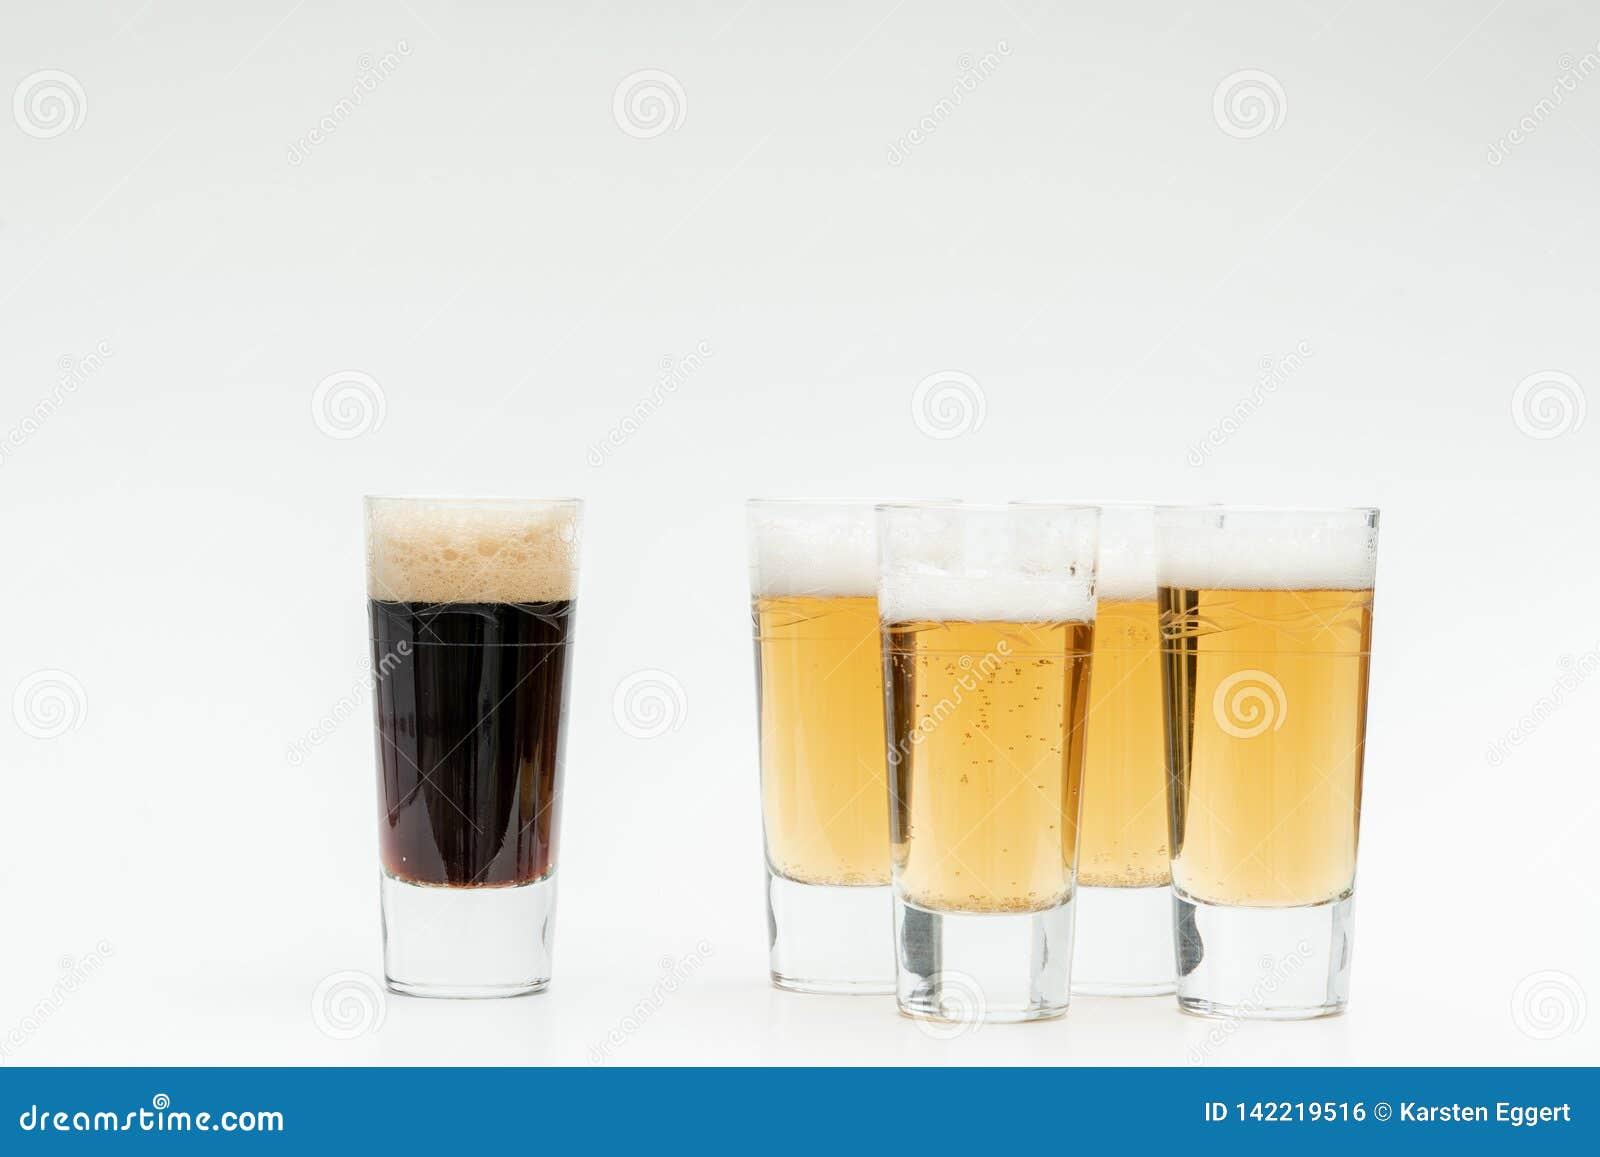 5 vasos de cerveza simbolizan diversidad